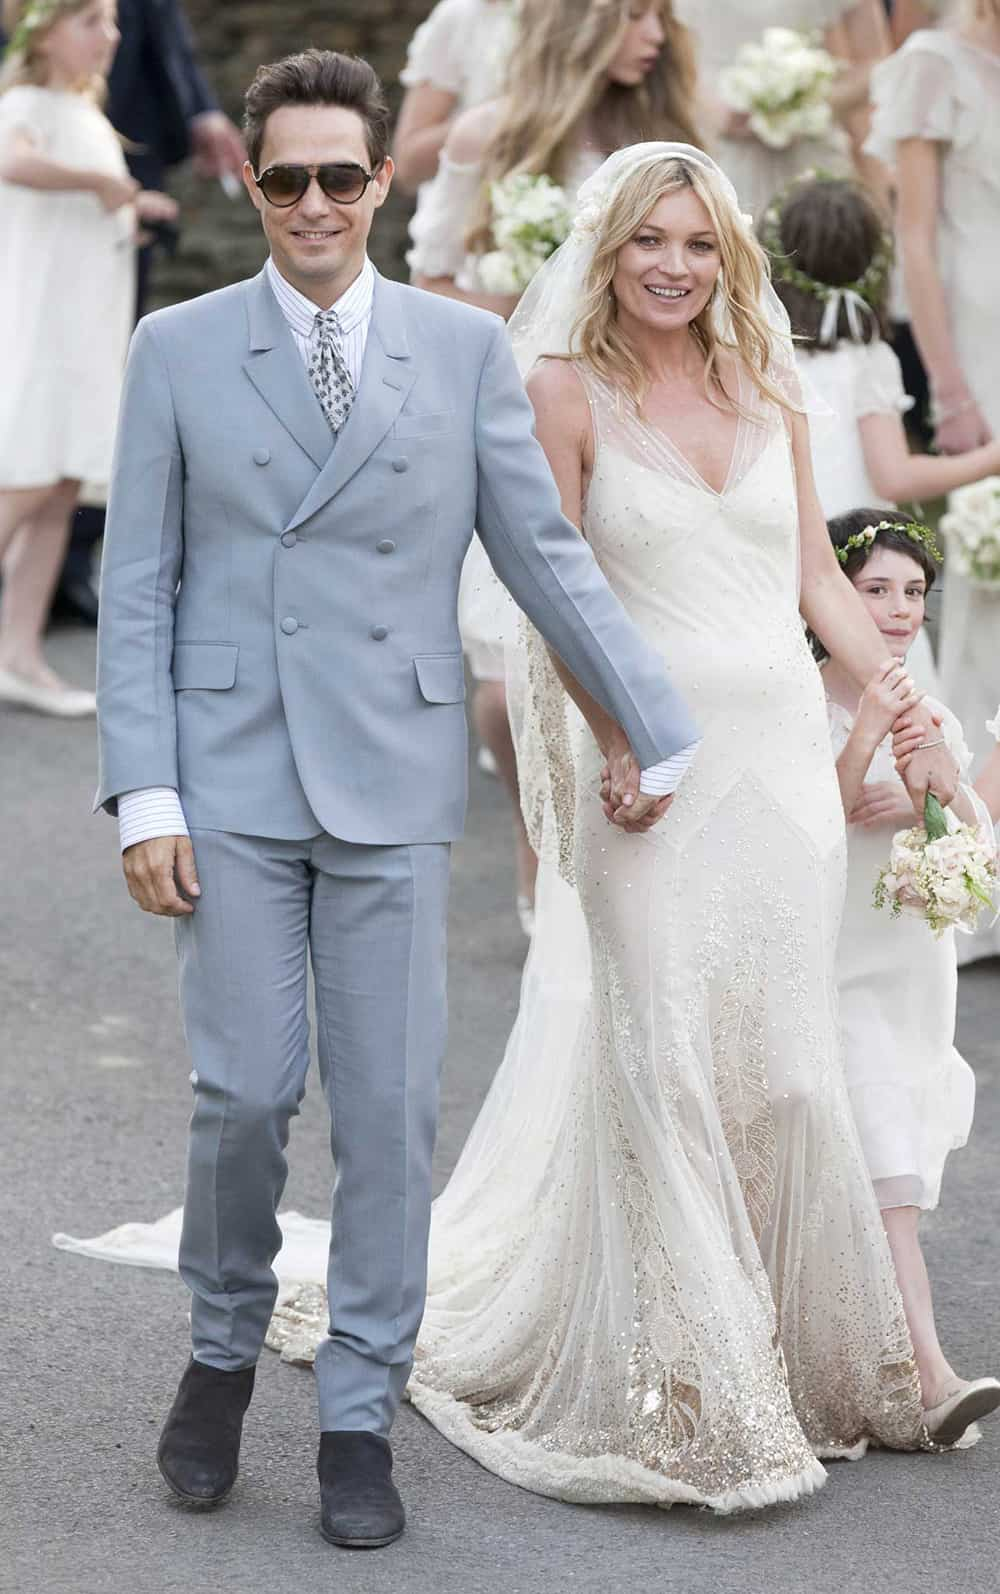 Wedding of Kate Moss.